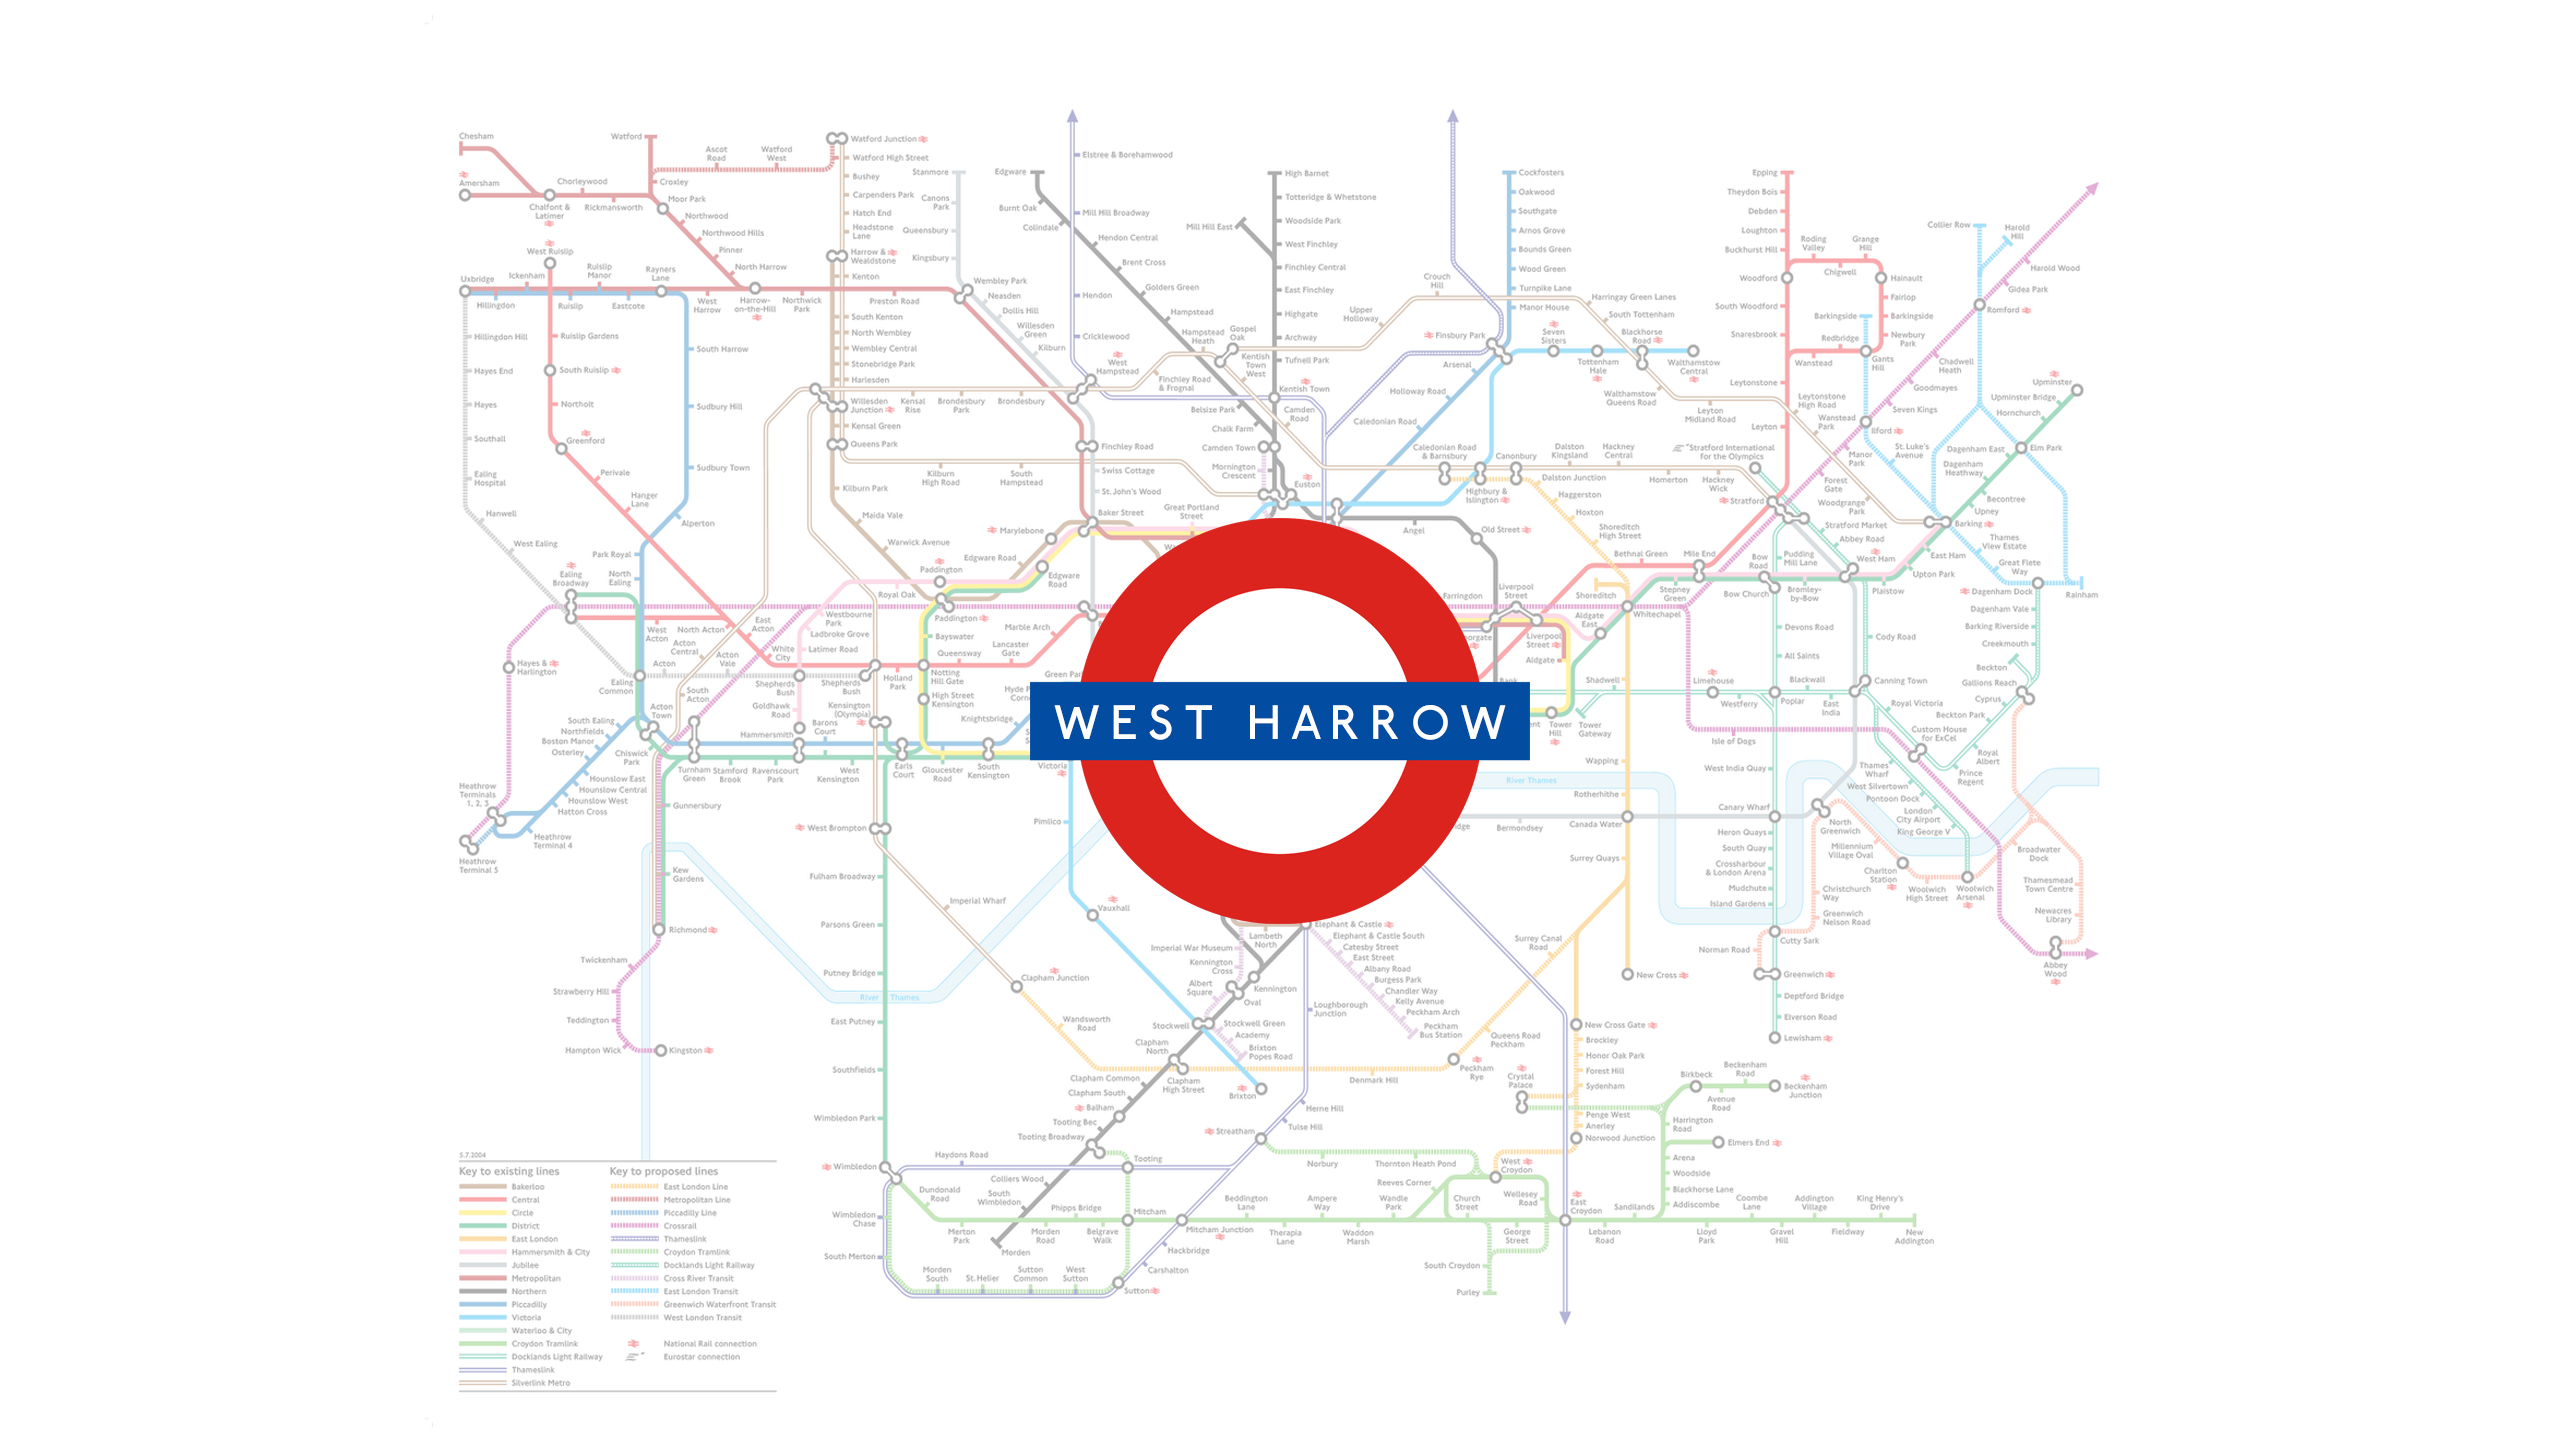 West Harrow (Map)